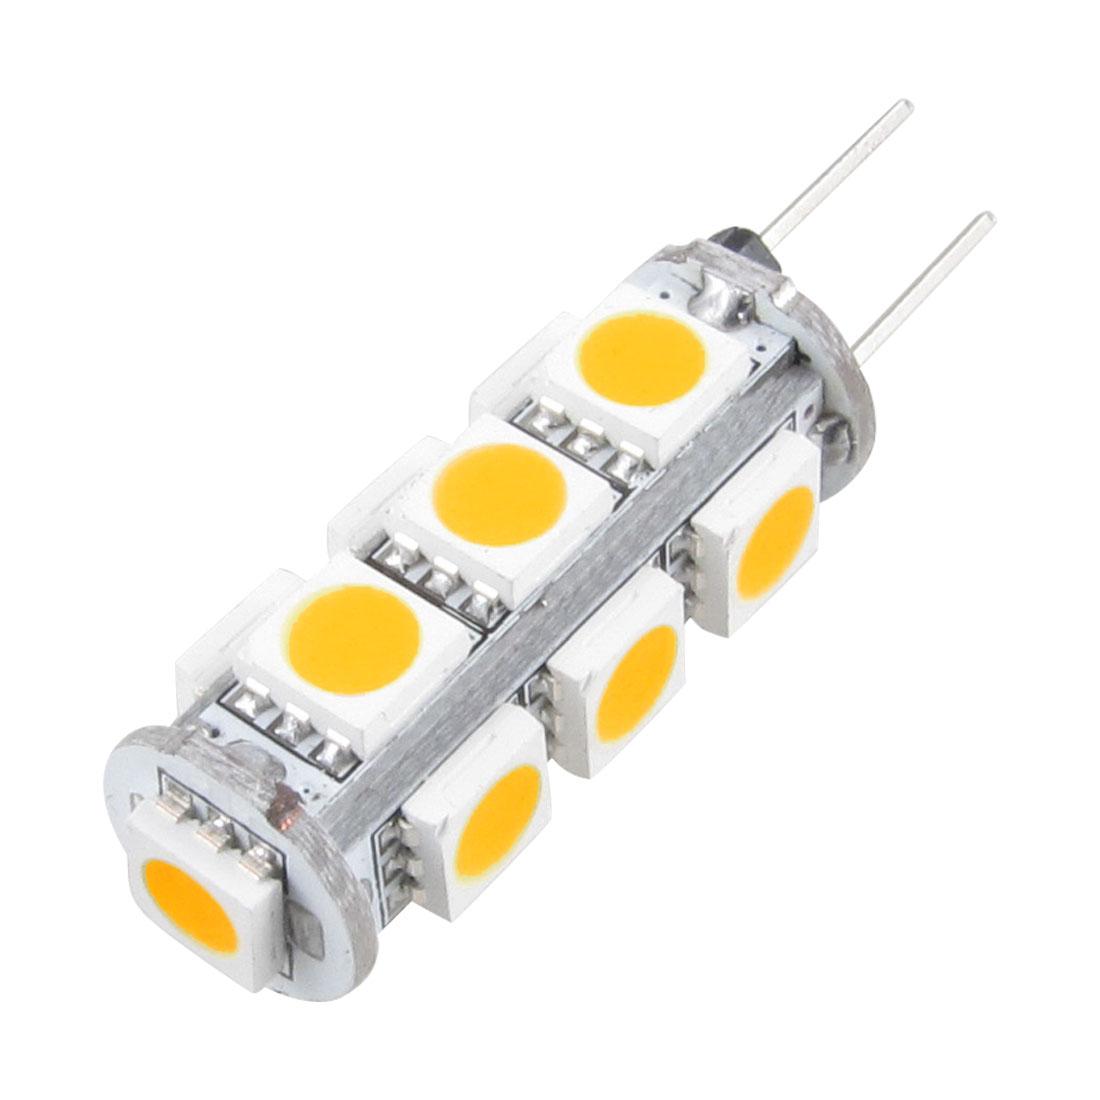 Unique Bargains Unique Bargains Warm White G4 13 5050 SMD LED Car Spot RV Boat Light Lamp Bulb 12v